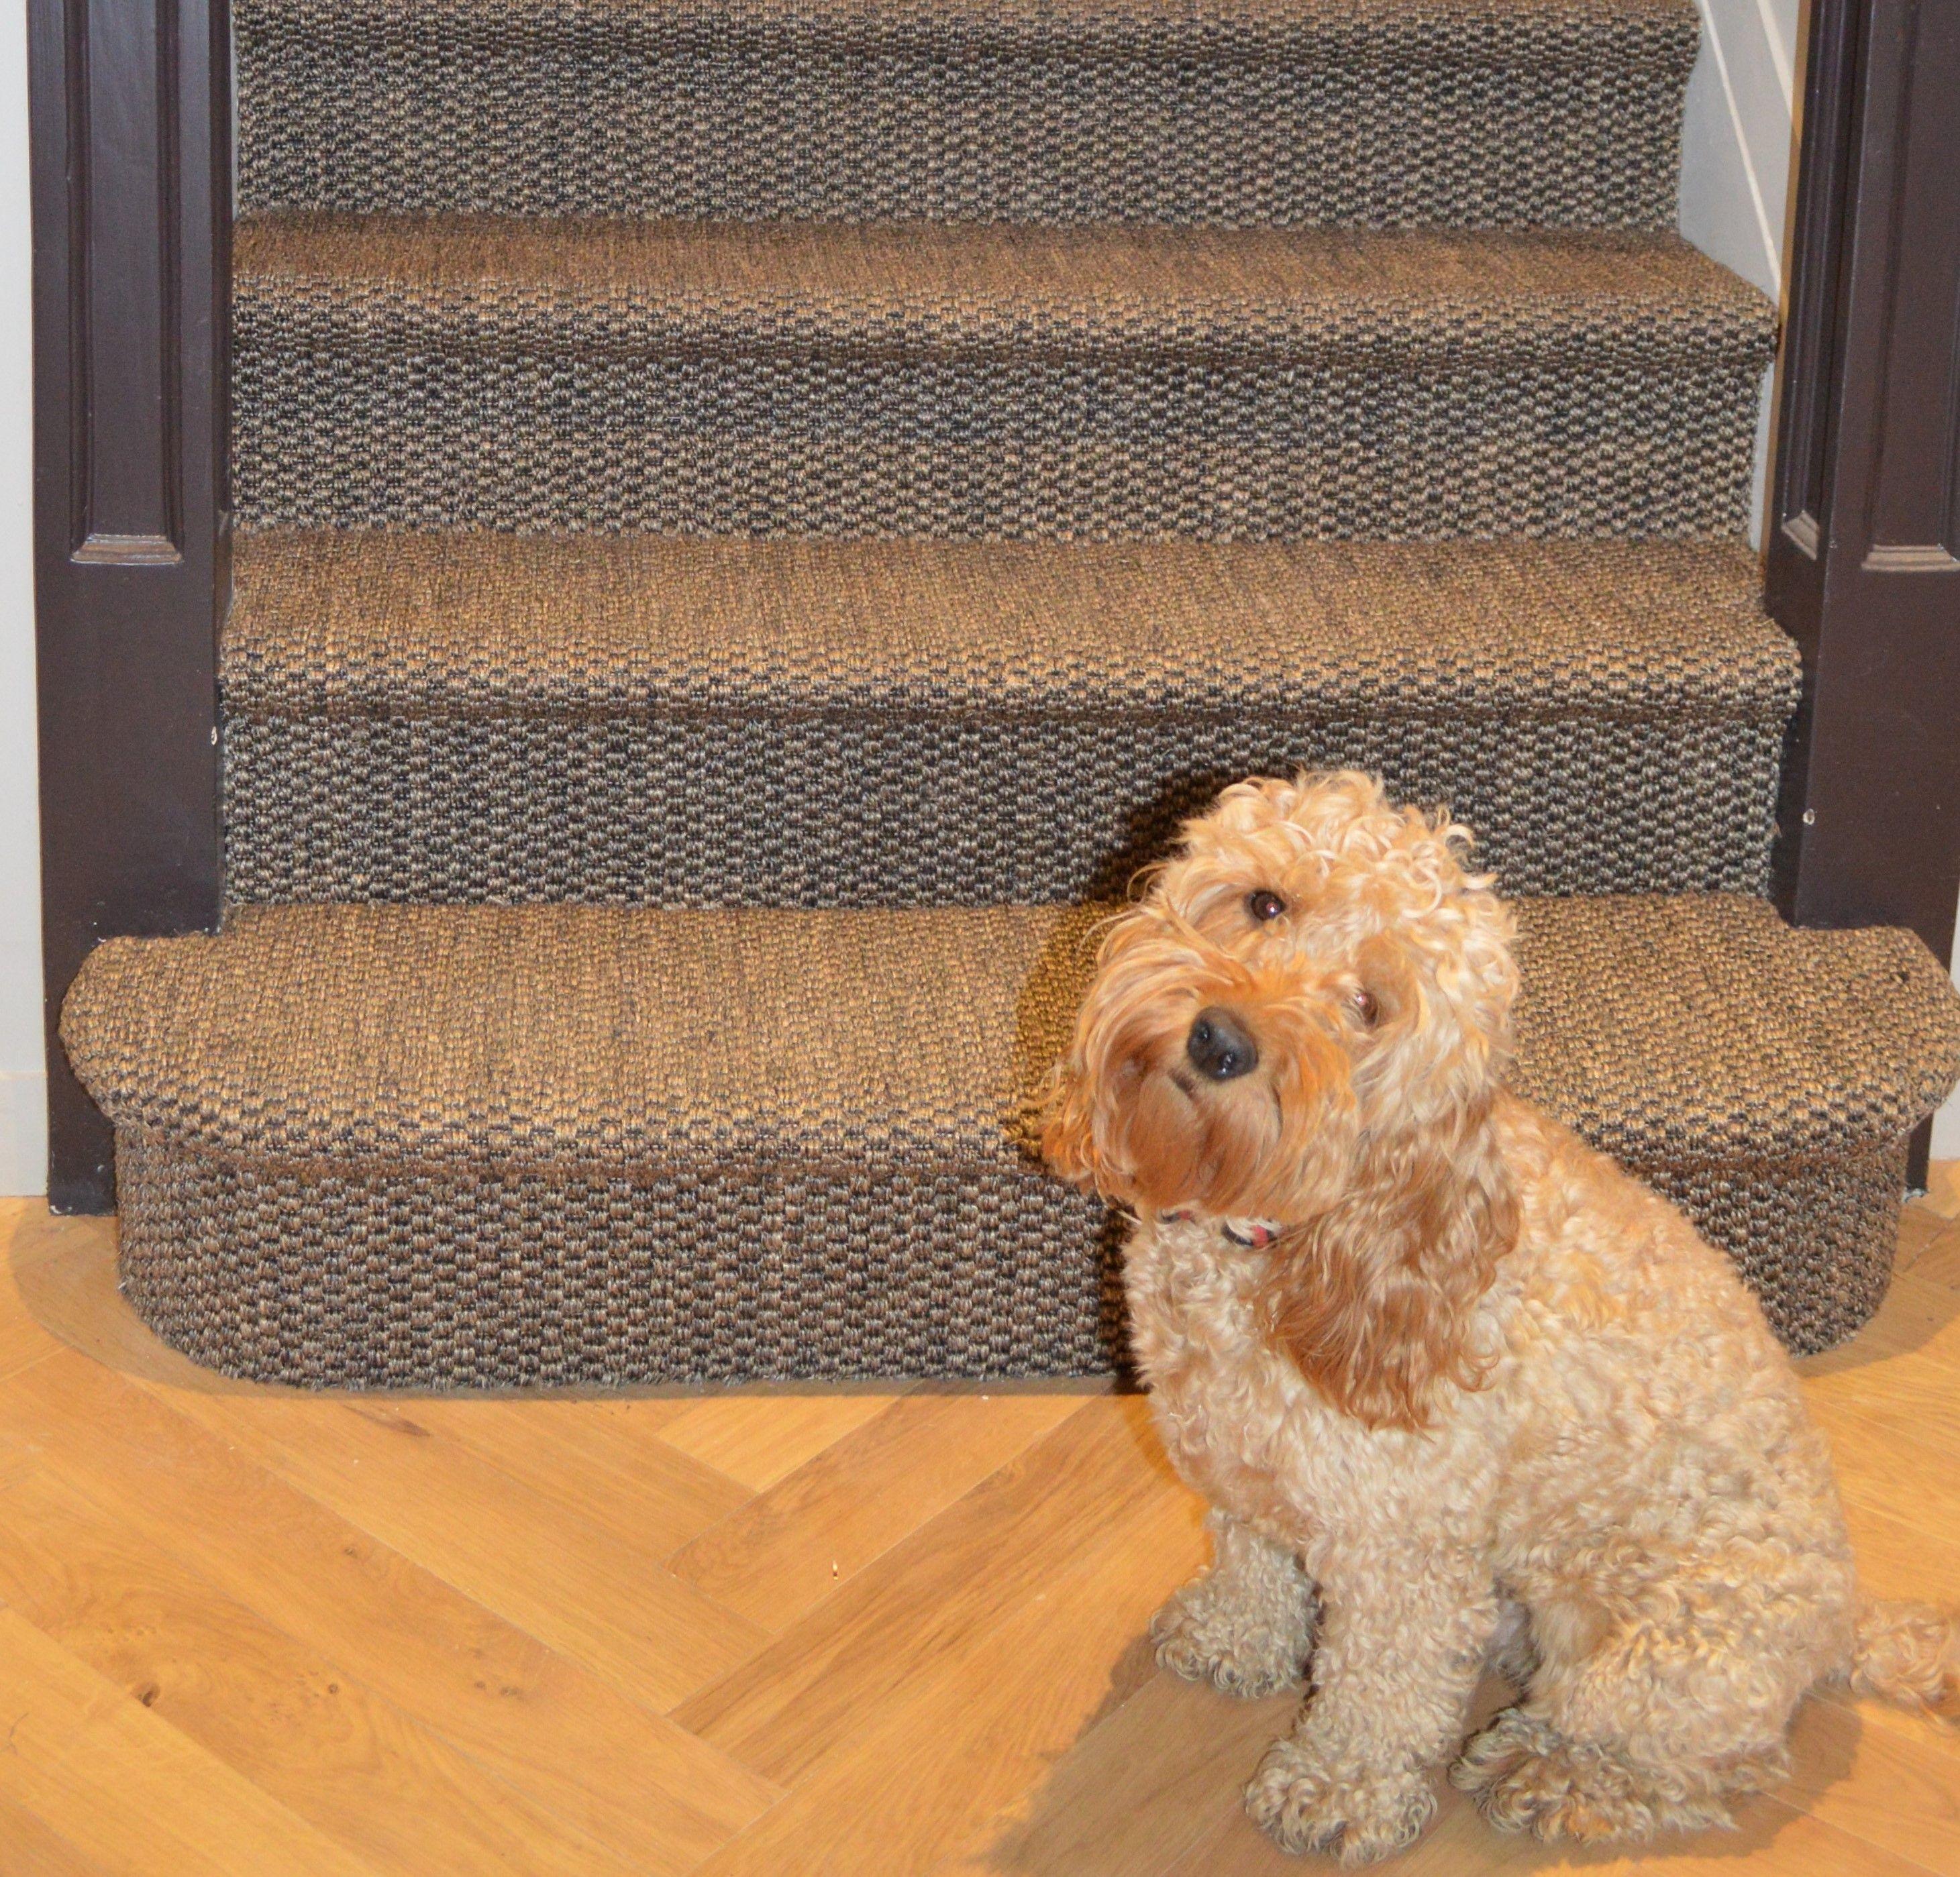 Rug Runner For Dogs: Sisal Stair Carpet With Bullnose & Cute Dog.